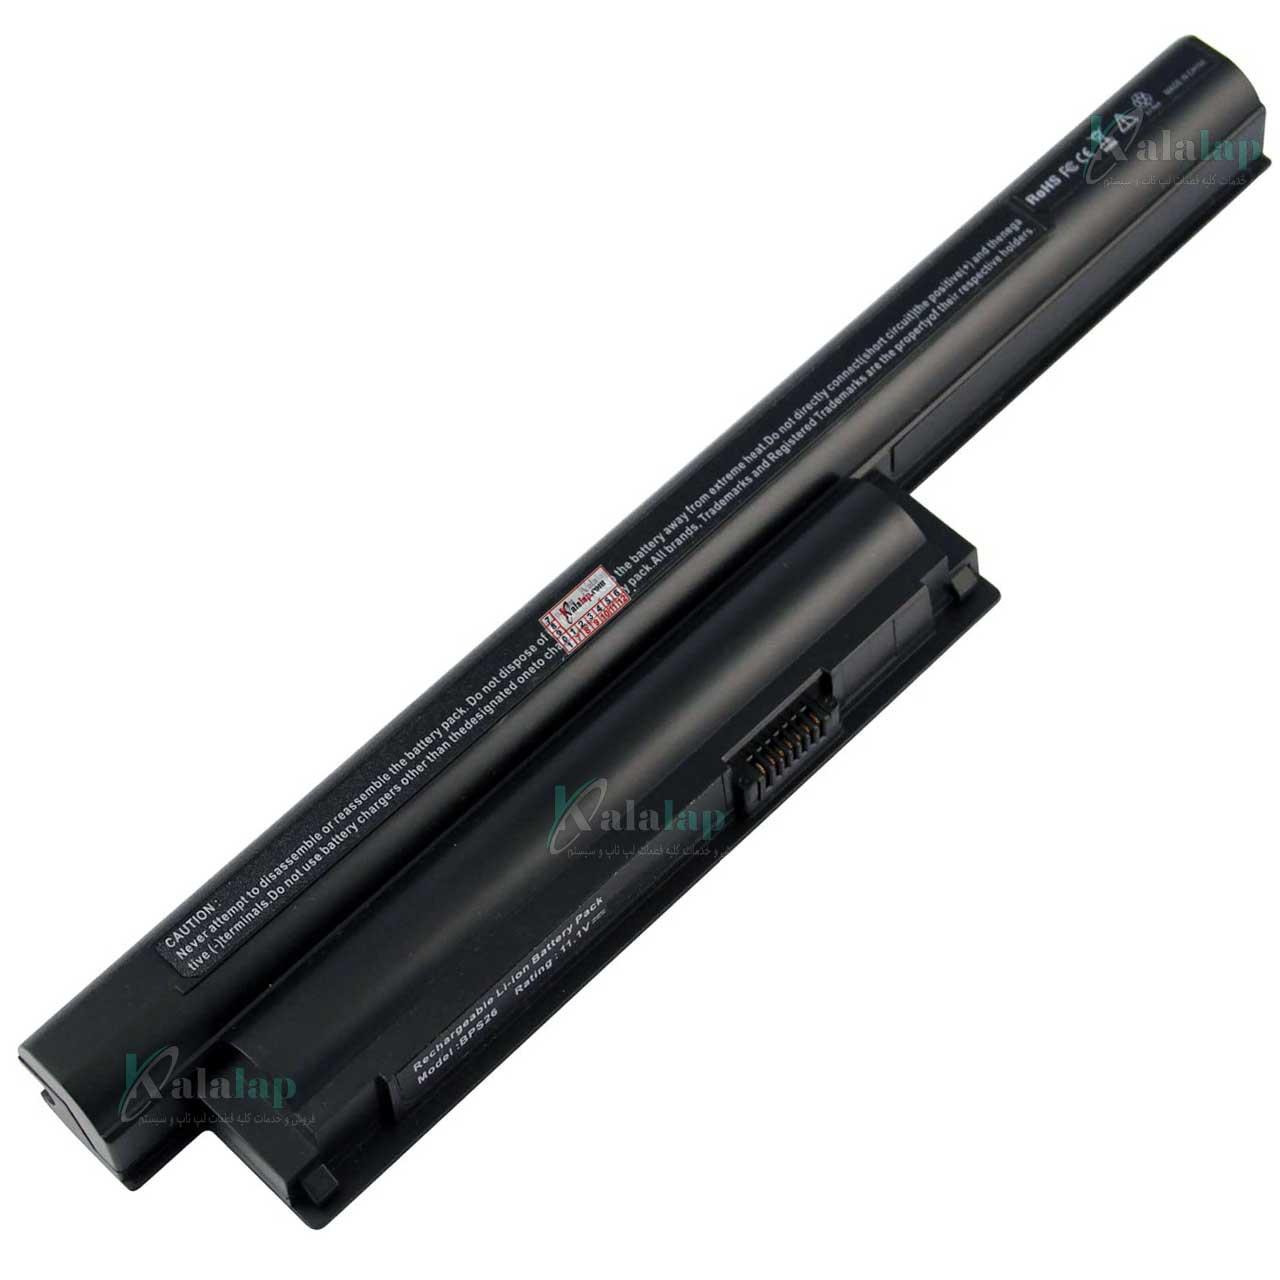 باتری لپ تاپ سونی Battery Laptop Sony VGP-BPS26